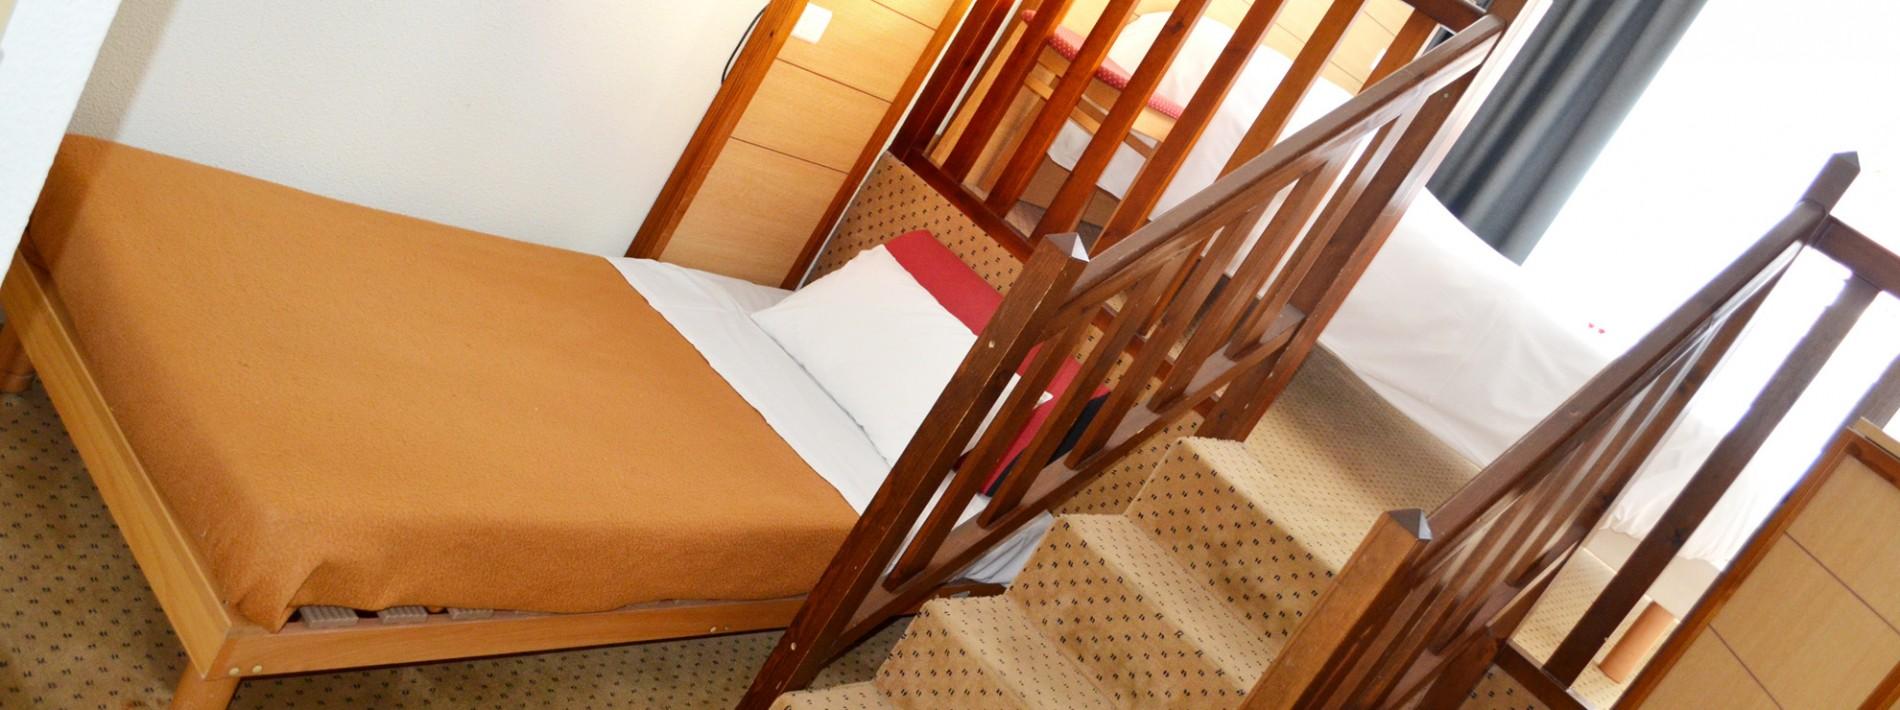 hotel-clermont-ferrand-volcan-hotel-3